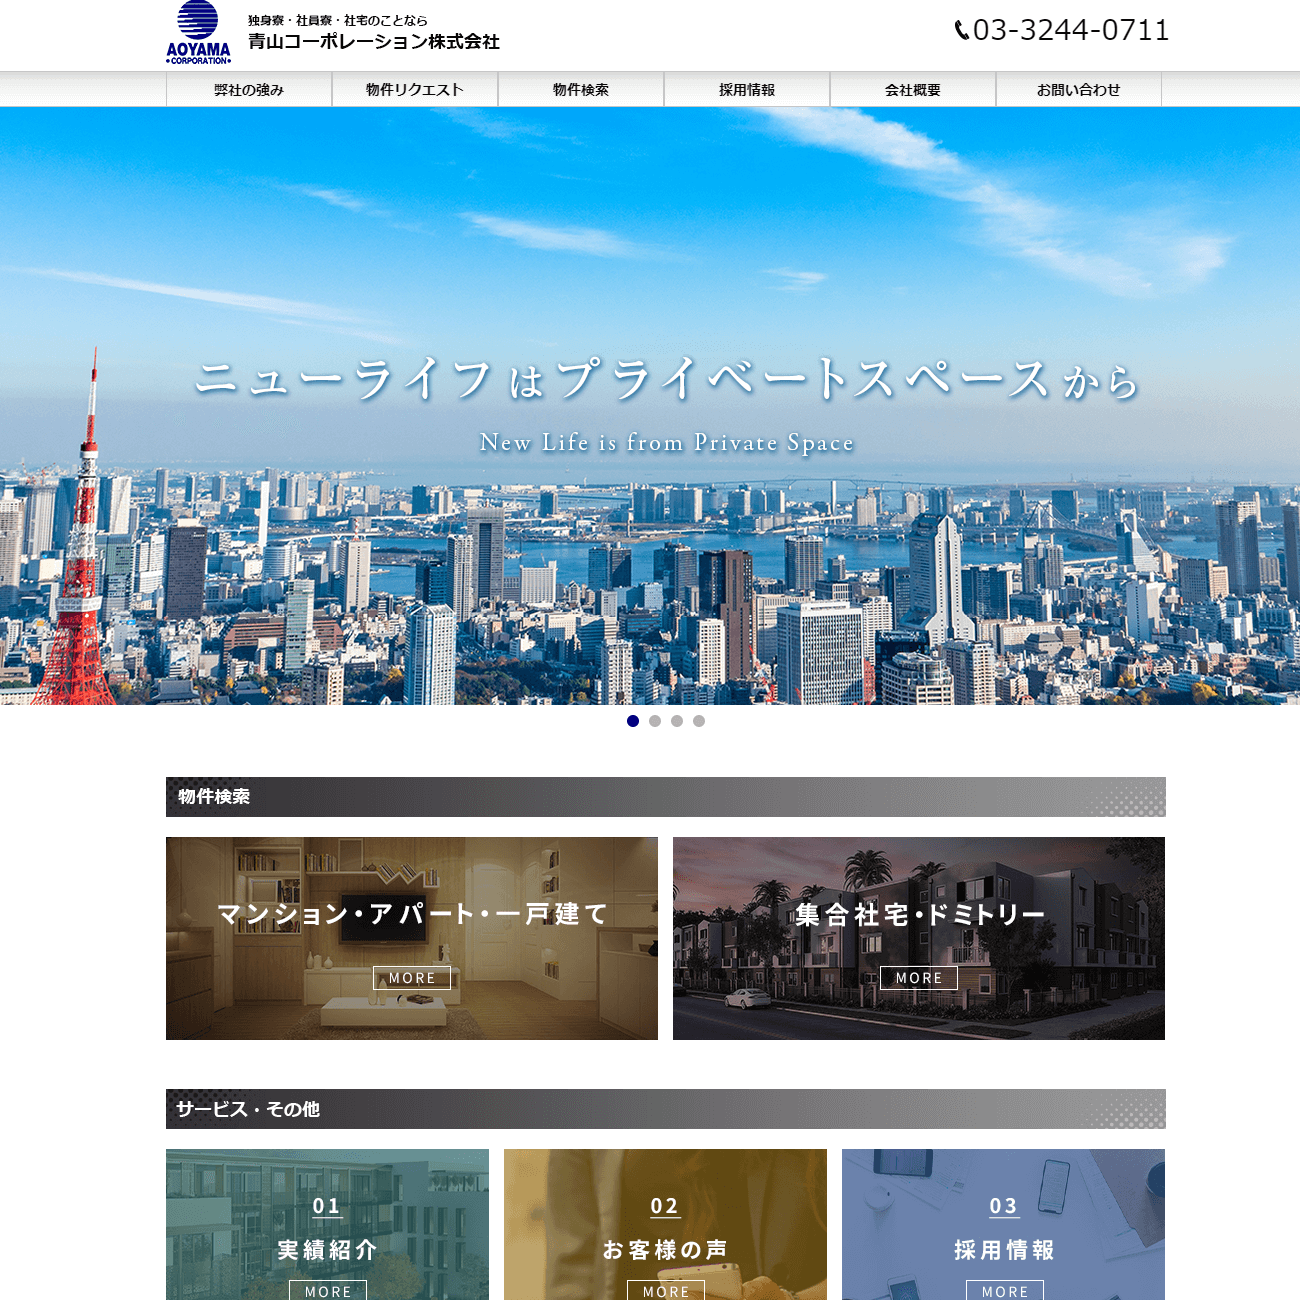 "<span class=""title"">青山コーポレーション株式会社の口コミや評判</span>"